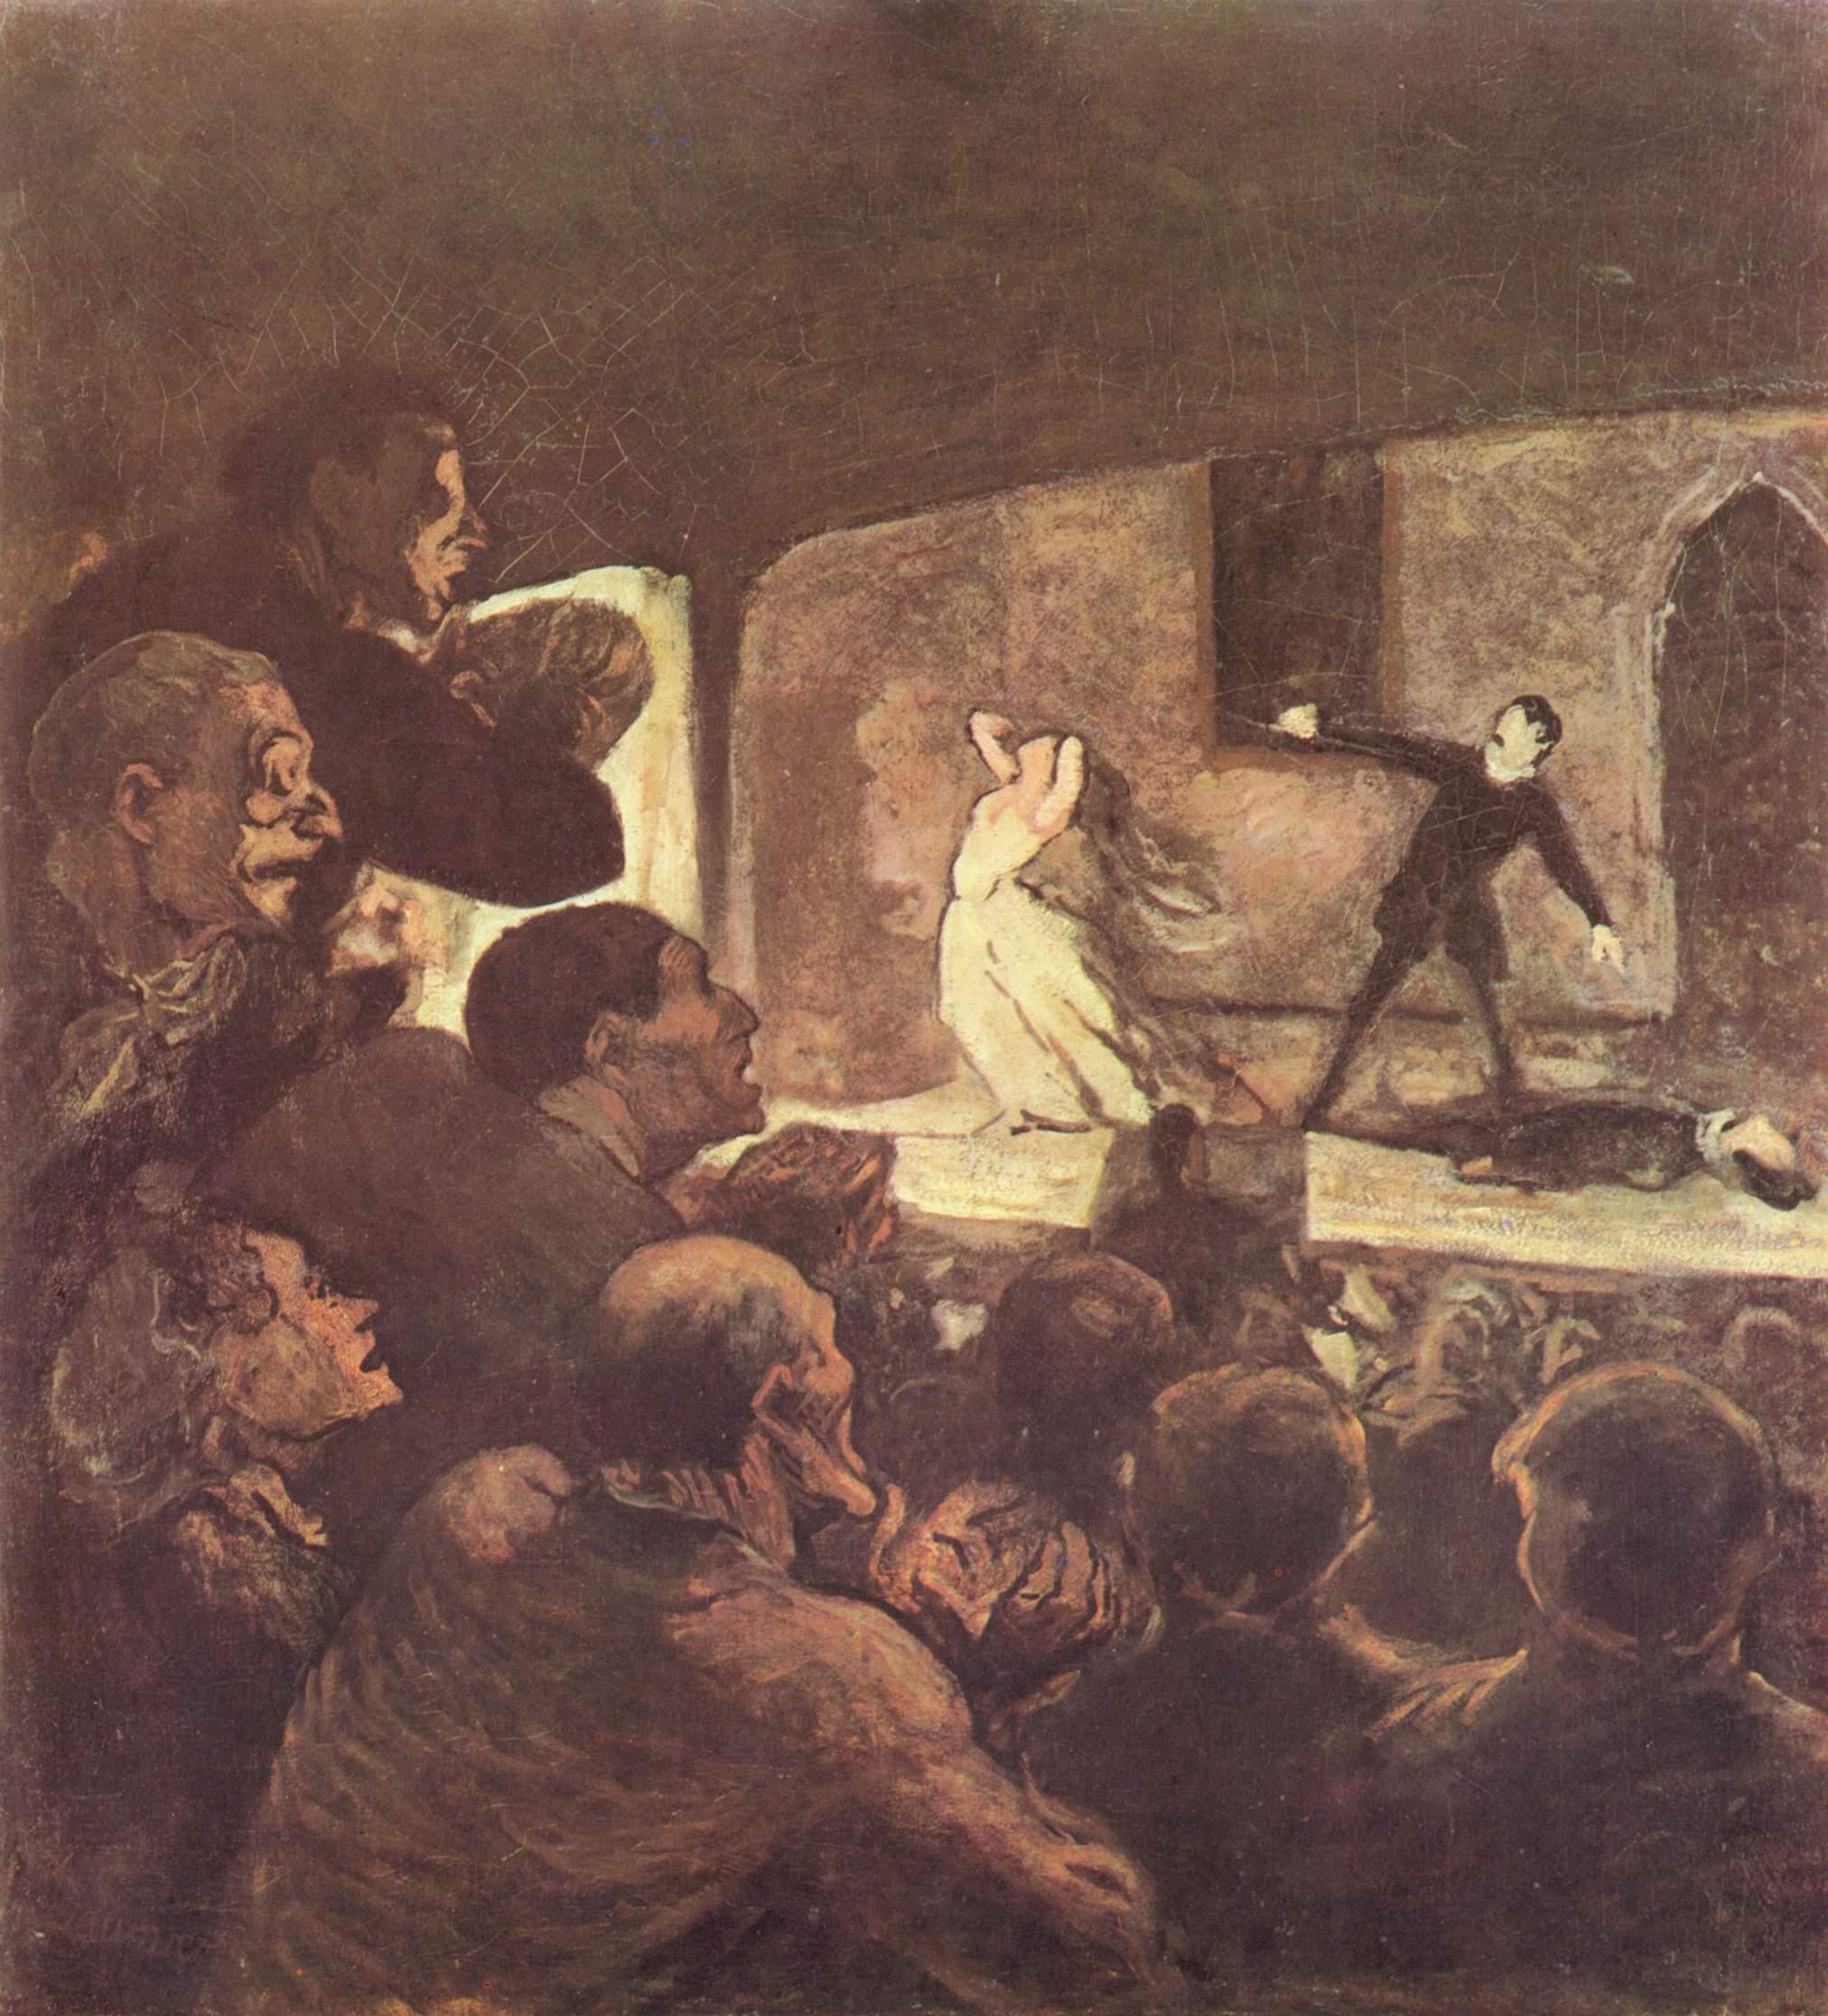 H.Daumier. El melodrama, 1860.